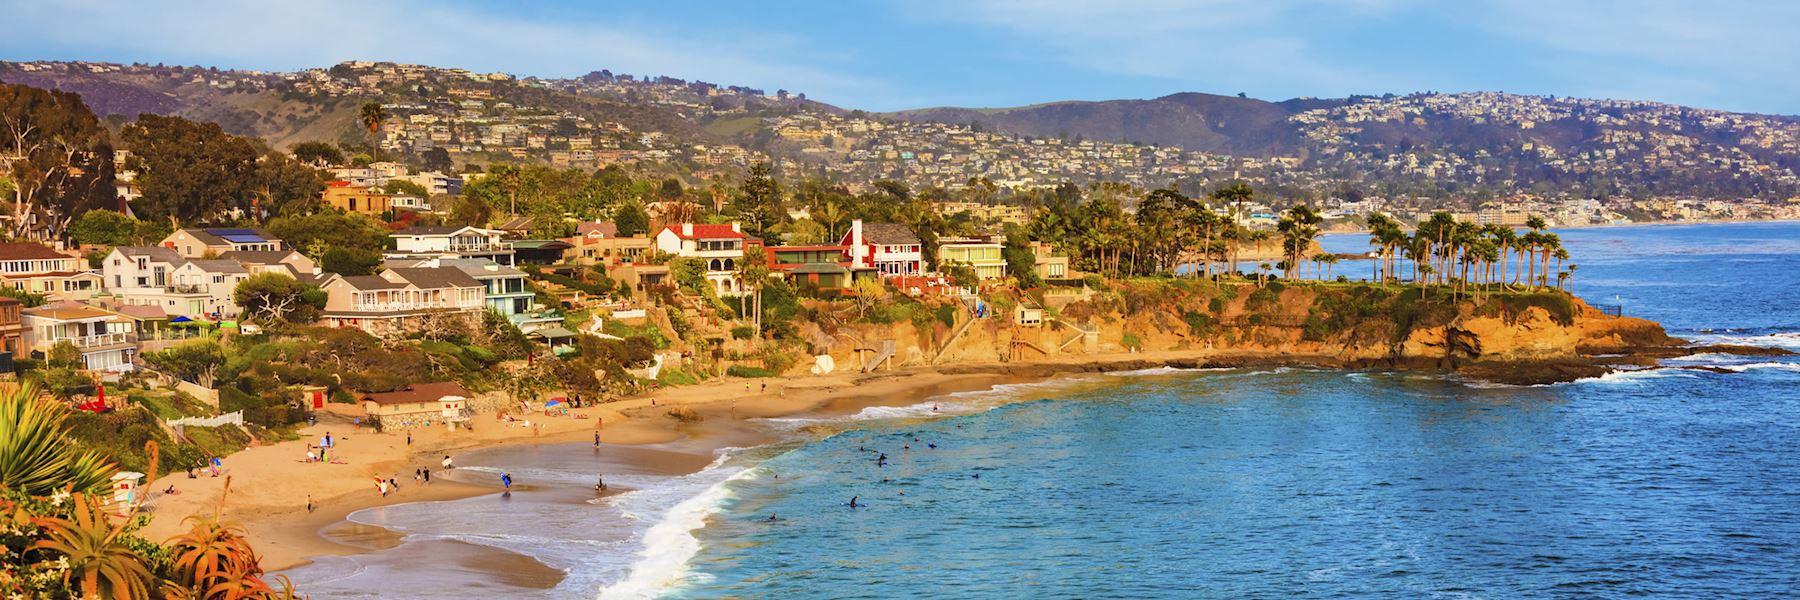 California holidays  2019 & 2020